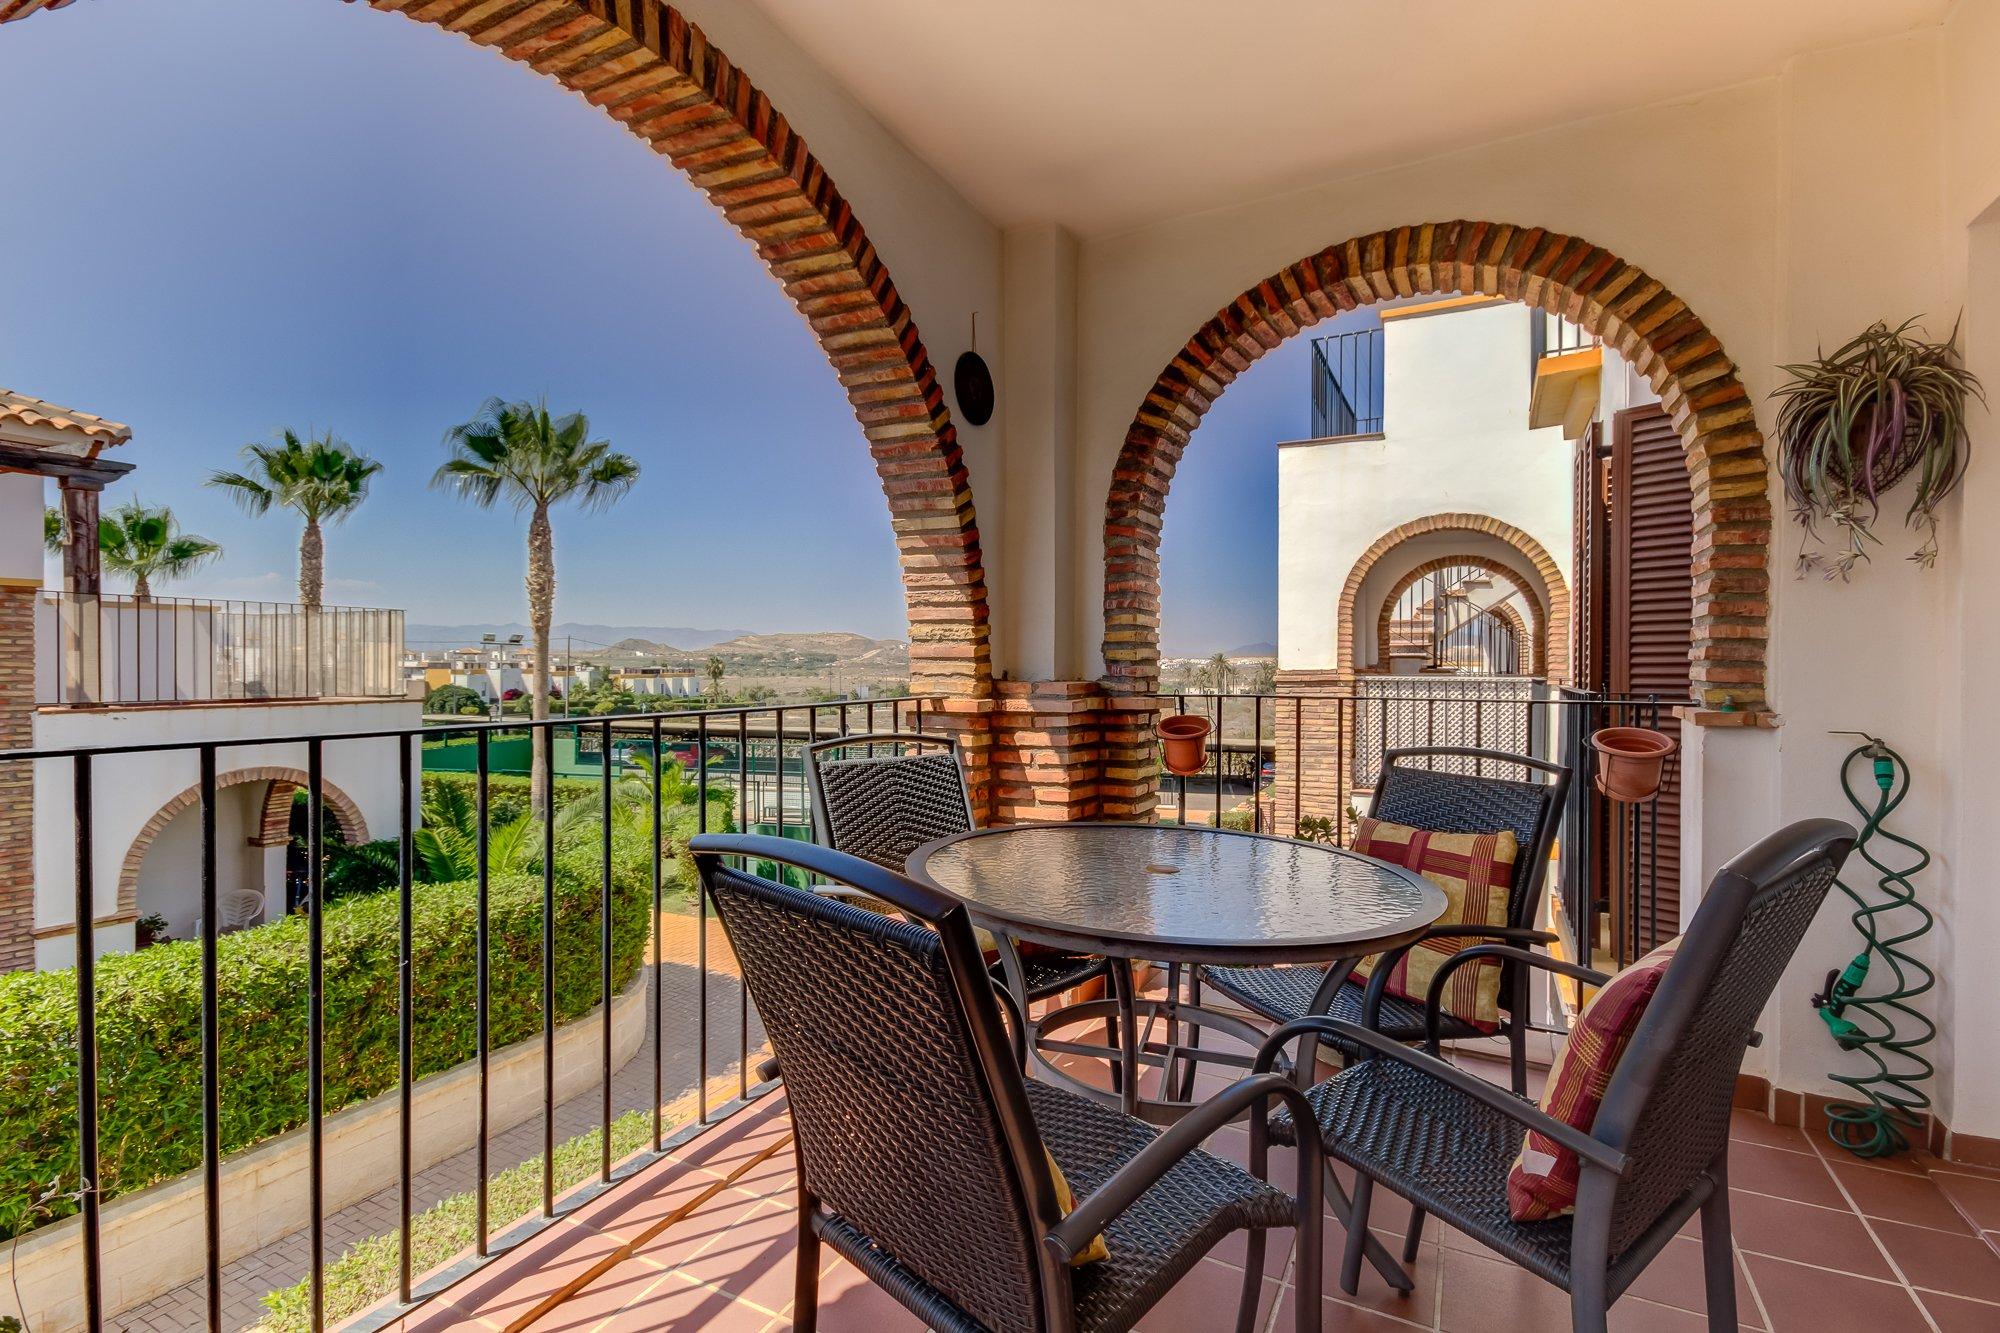 Alquiler de apartamento en Al Andaluss Residencial RA